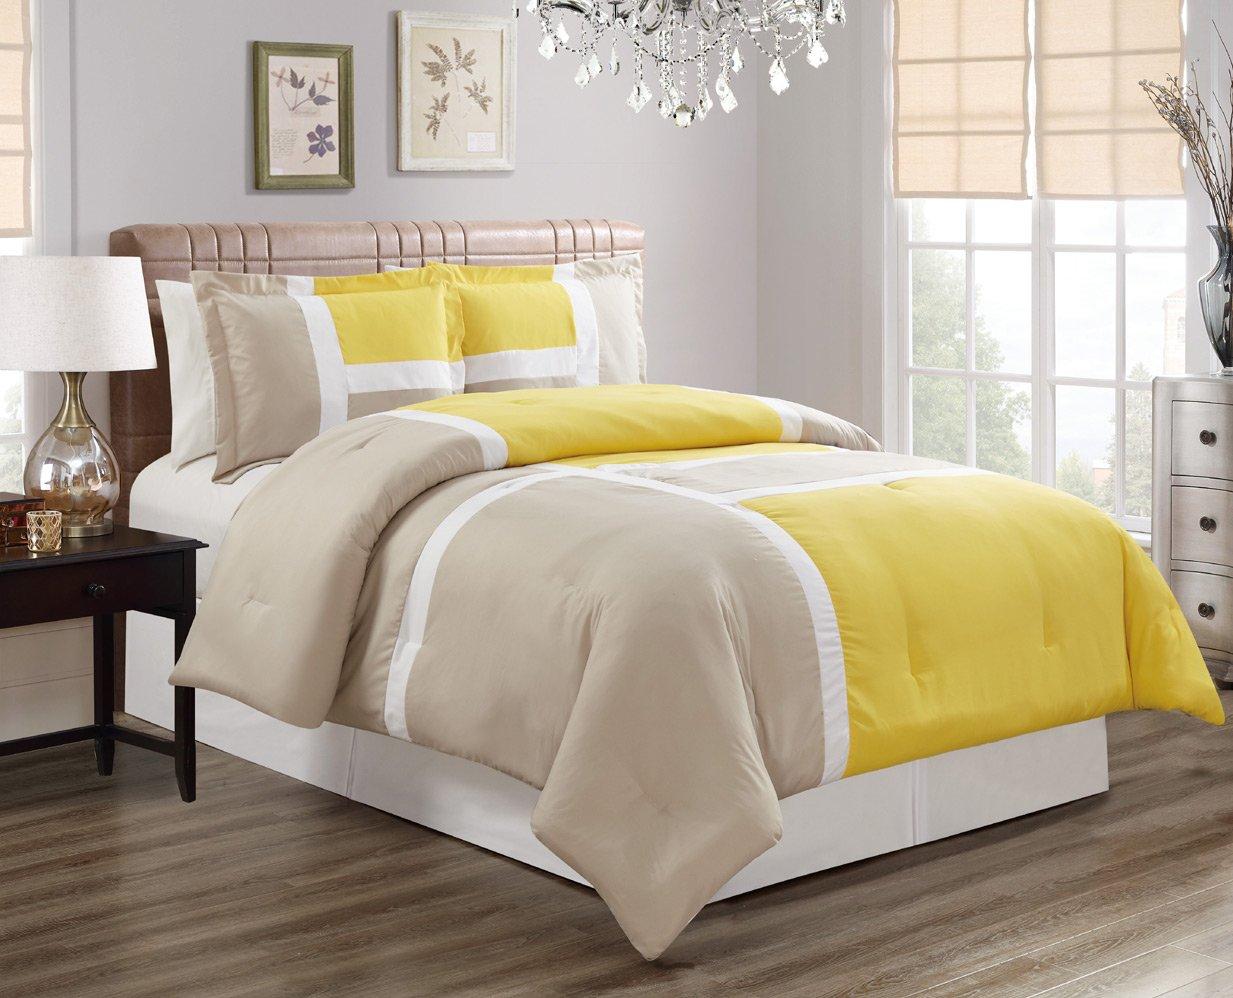 grandlinen 3ピース高級Gooseダウン代替掛け布団セット、フル/クイーンwithコーナータブ布団挿入 ツイン イエロー B07CM8VXRH ツイン Yellow / Grey Yellow / Grey ツイン